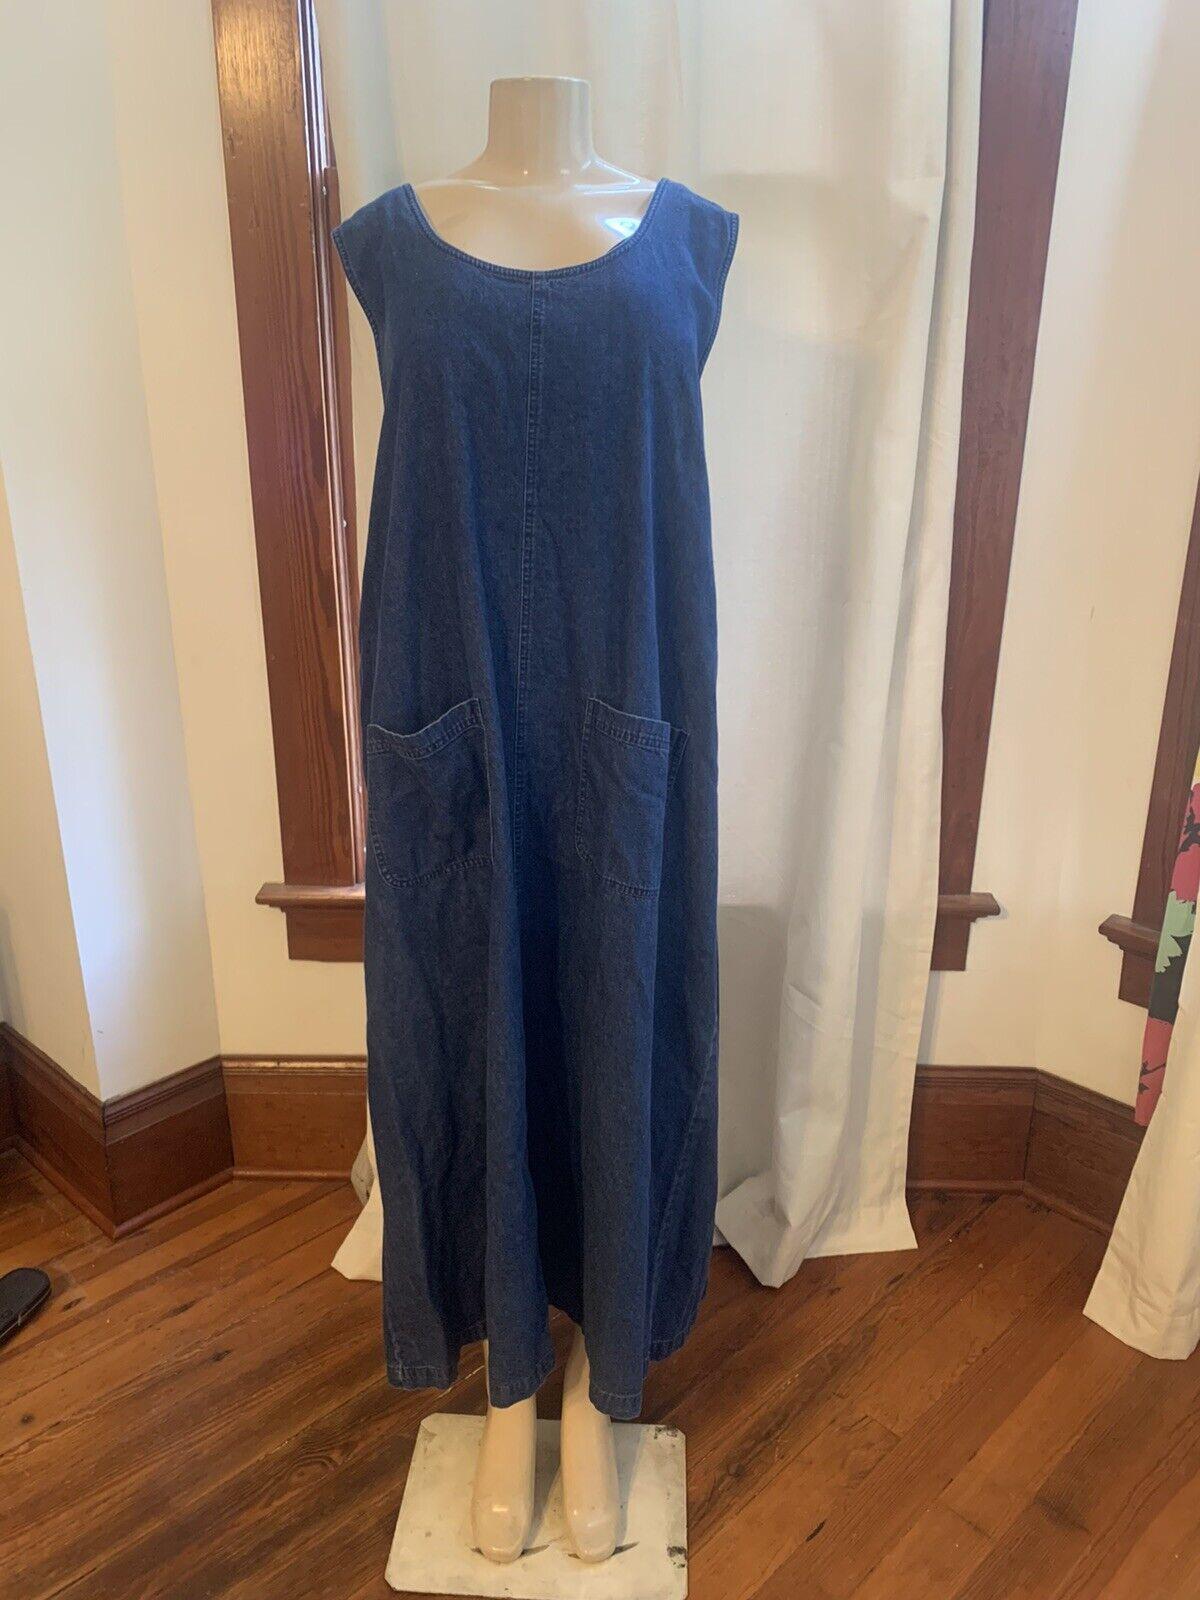 Vtg 90s Denim Jean Jumper Apron Maxi Dress Sz 3X … - image 1